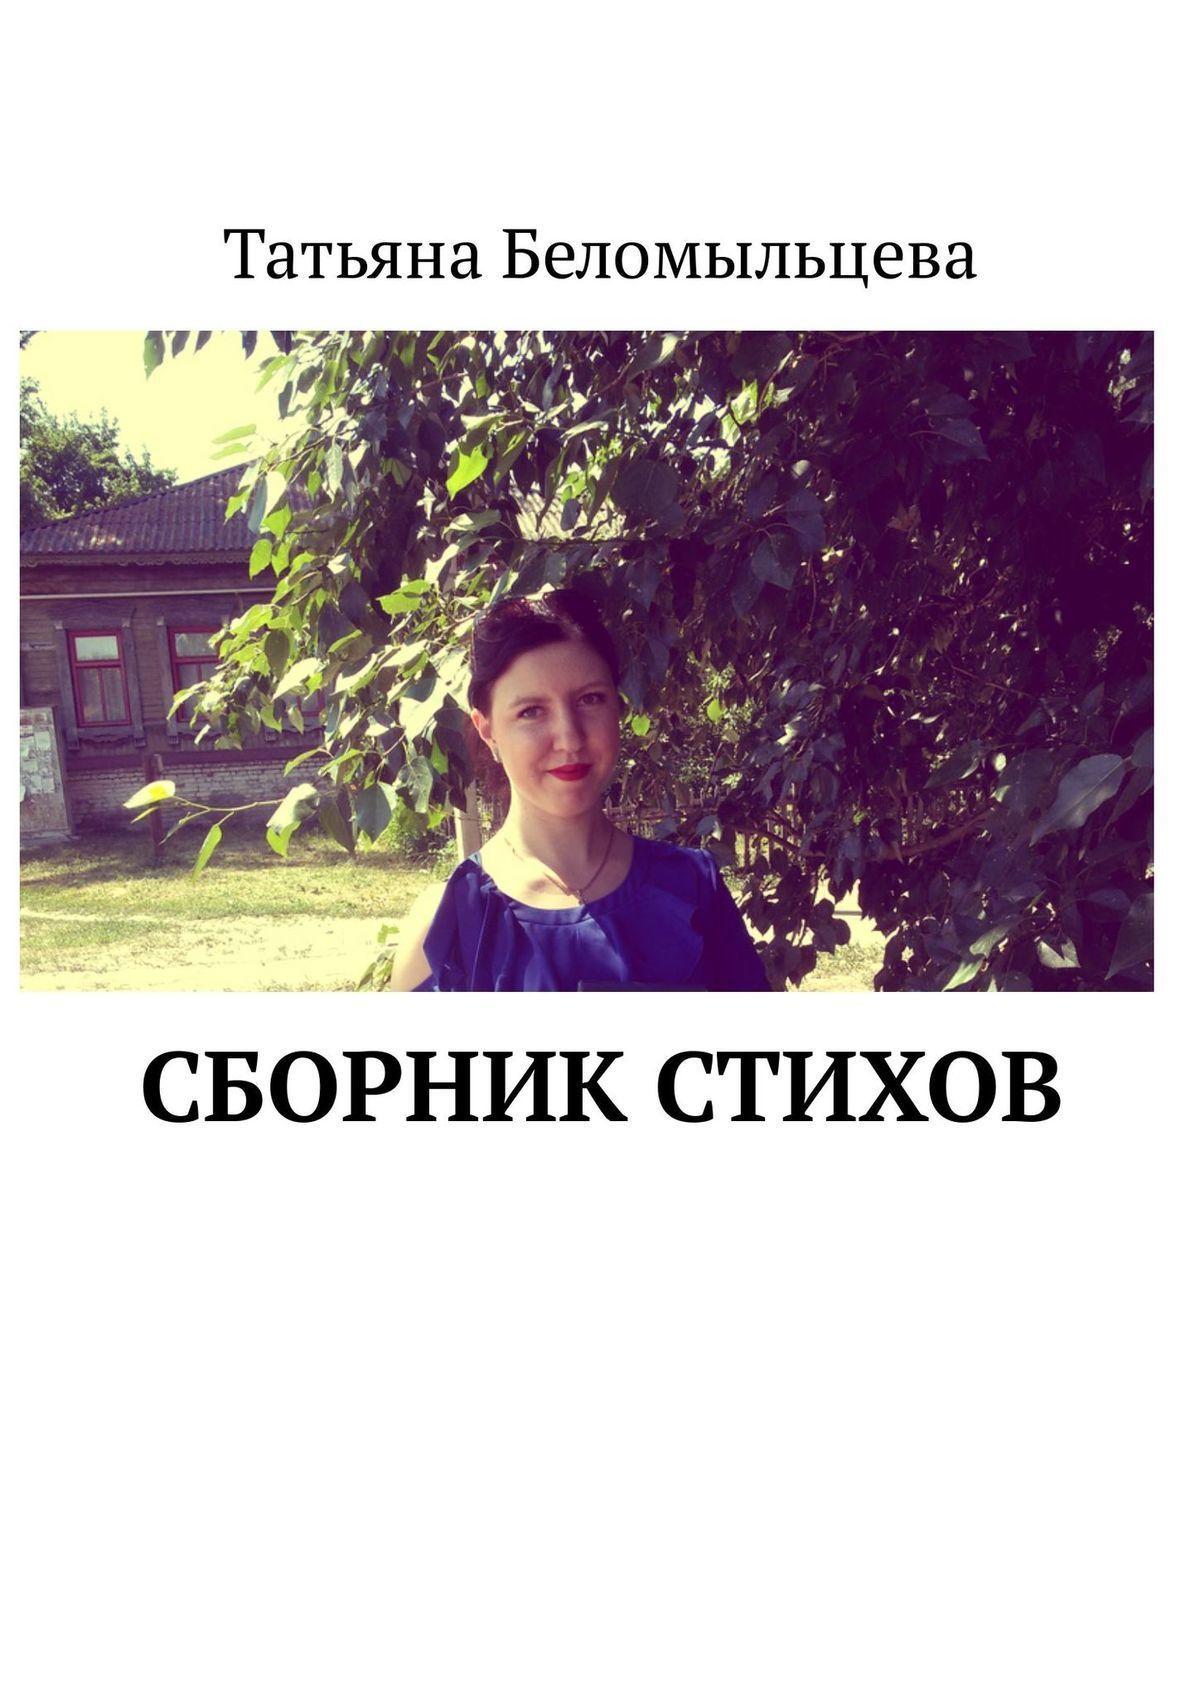 Татьяна Беломыльцева Сборник стихов